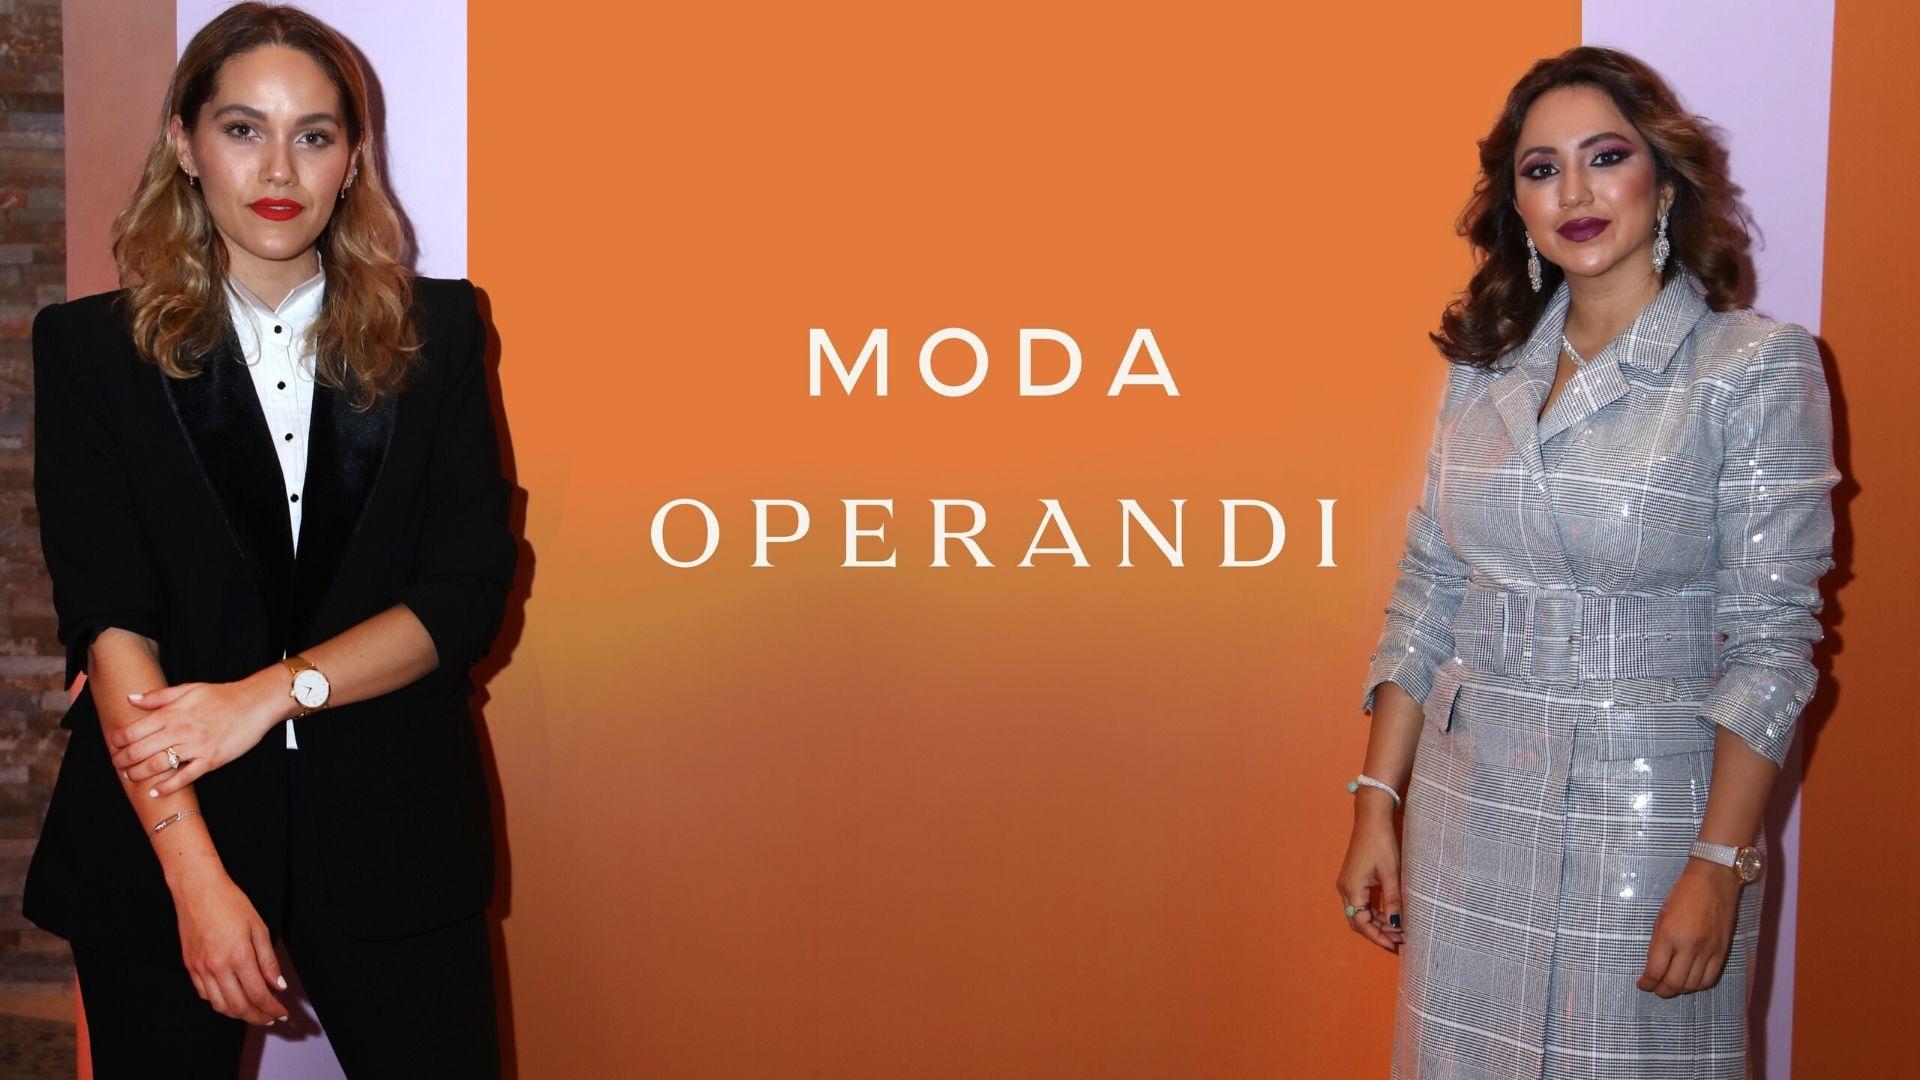 Moda Operandi Celebrates Expansion Into Middle Eastern Markets